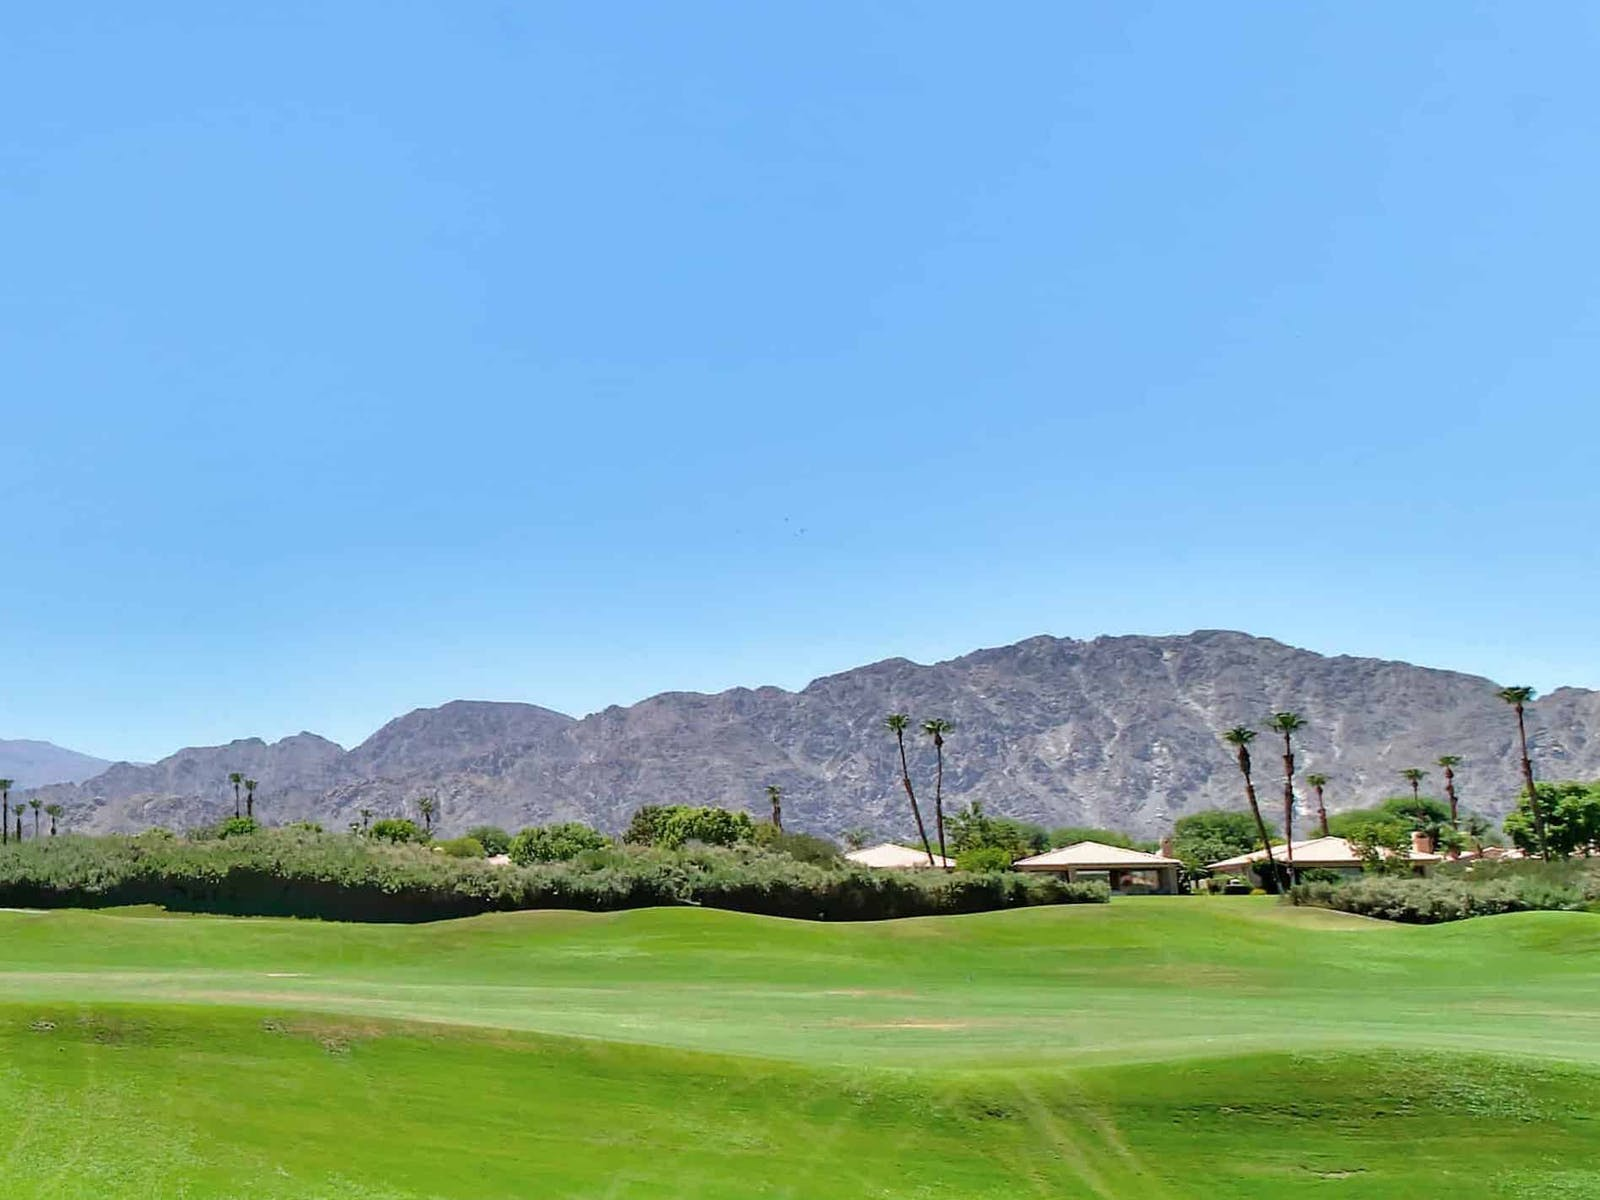 Golf course in Coachella Valley, CA